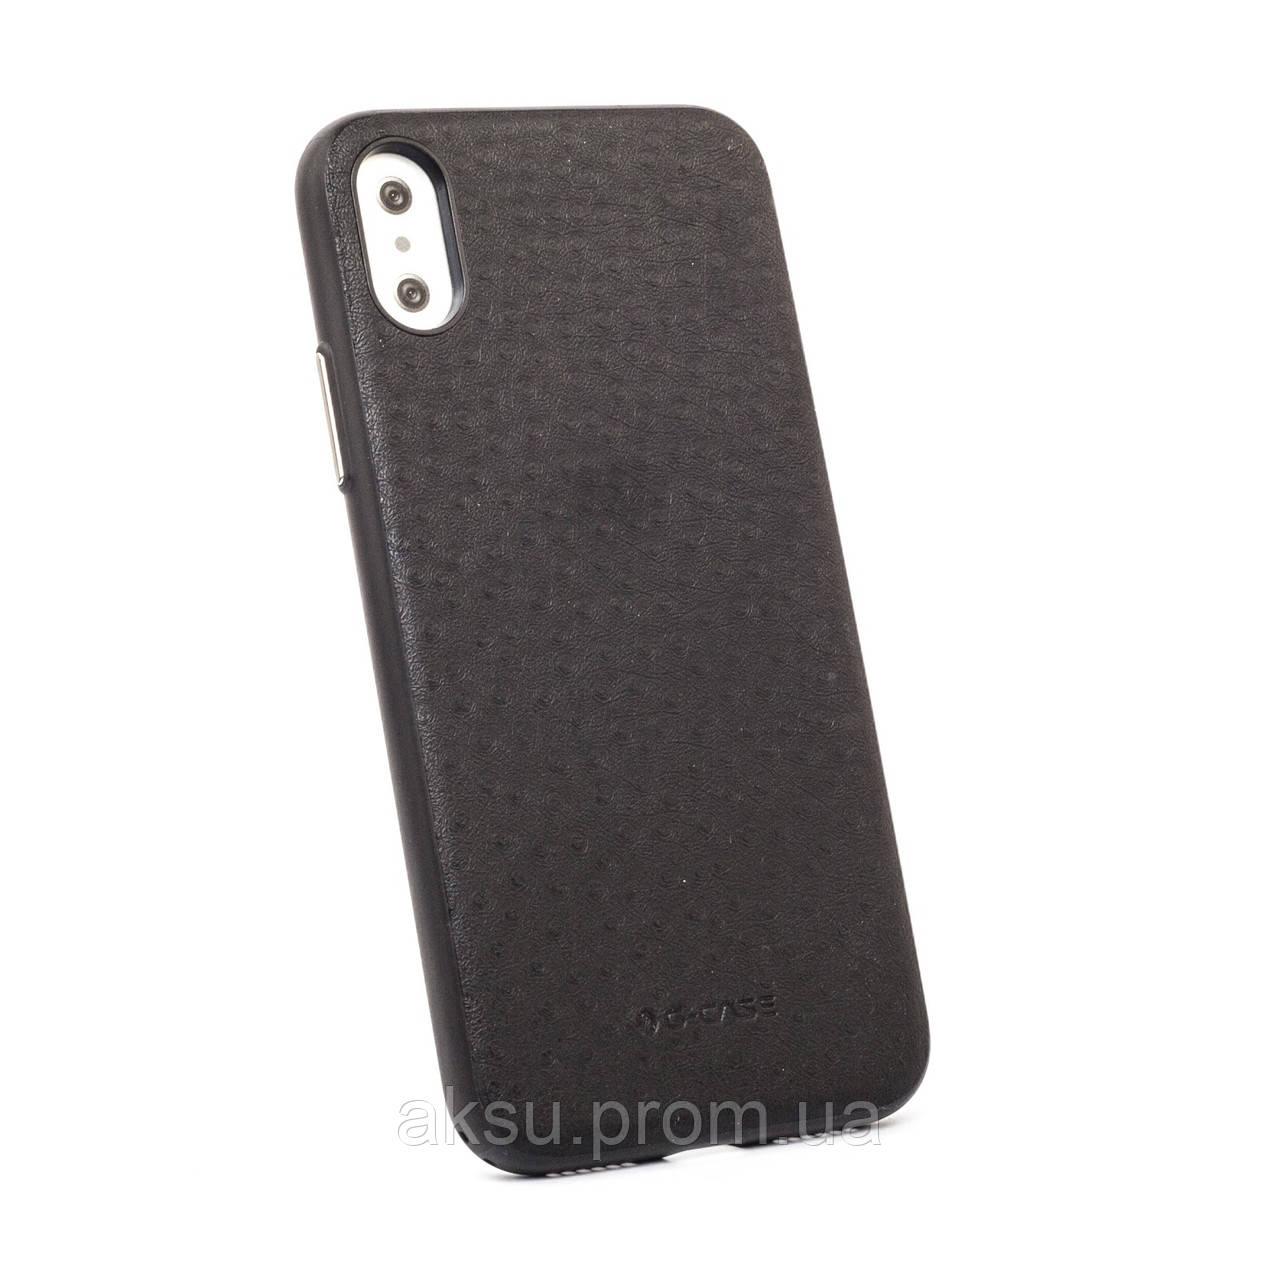 Чехол Dark Series blkcar для iPhone X Black